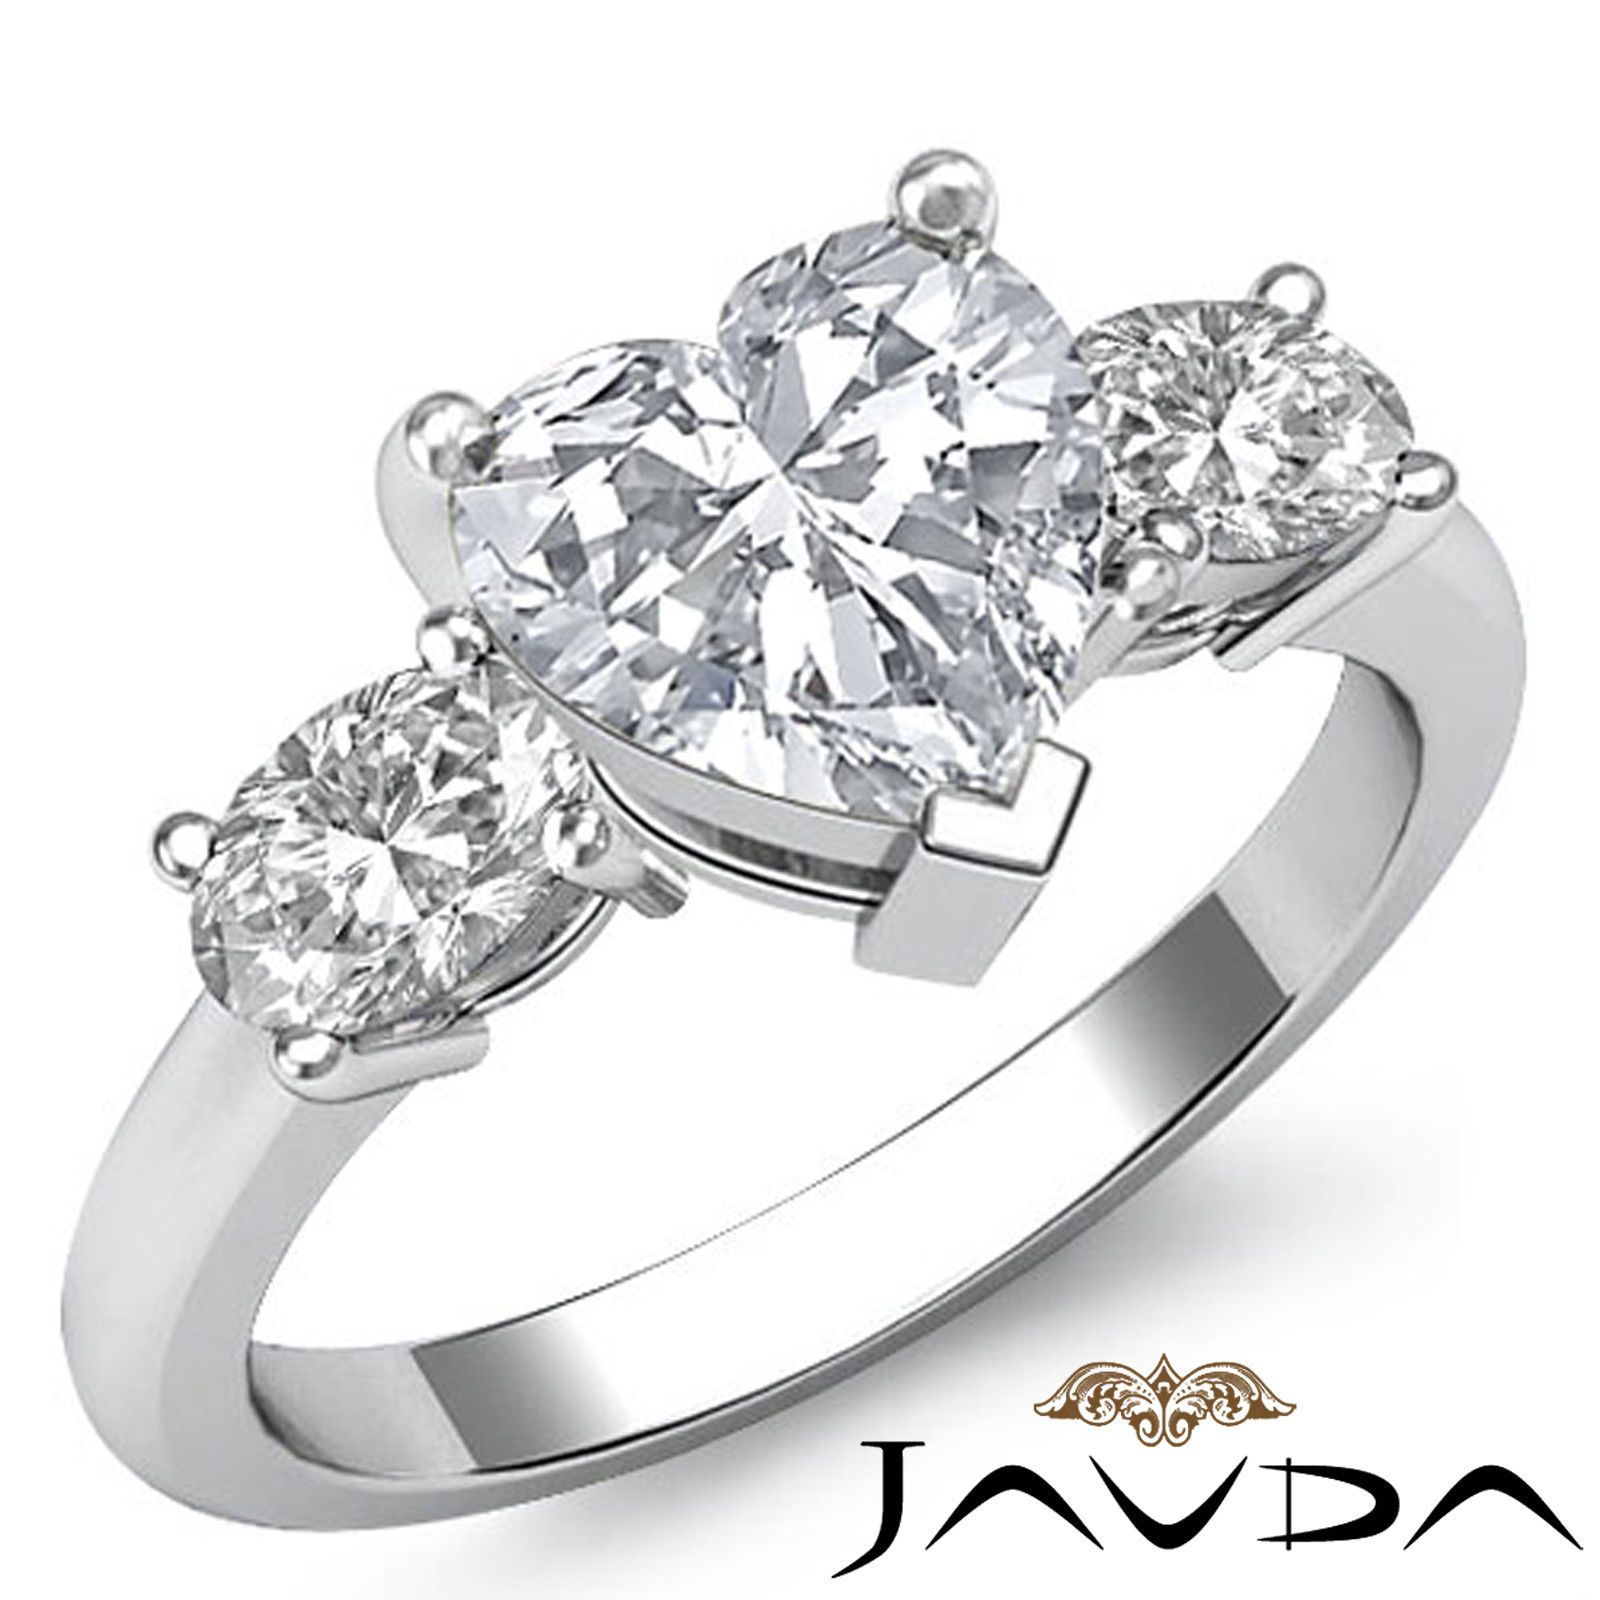 Heart Cut Diamond 3 Stone Gorgeous Engagement Ring Egl E Si1 Platinum 950 1  5 Ct